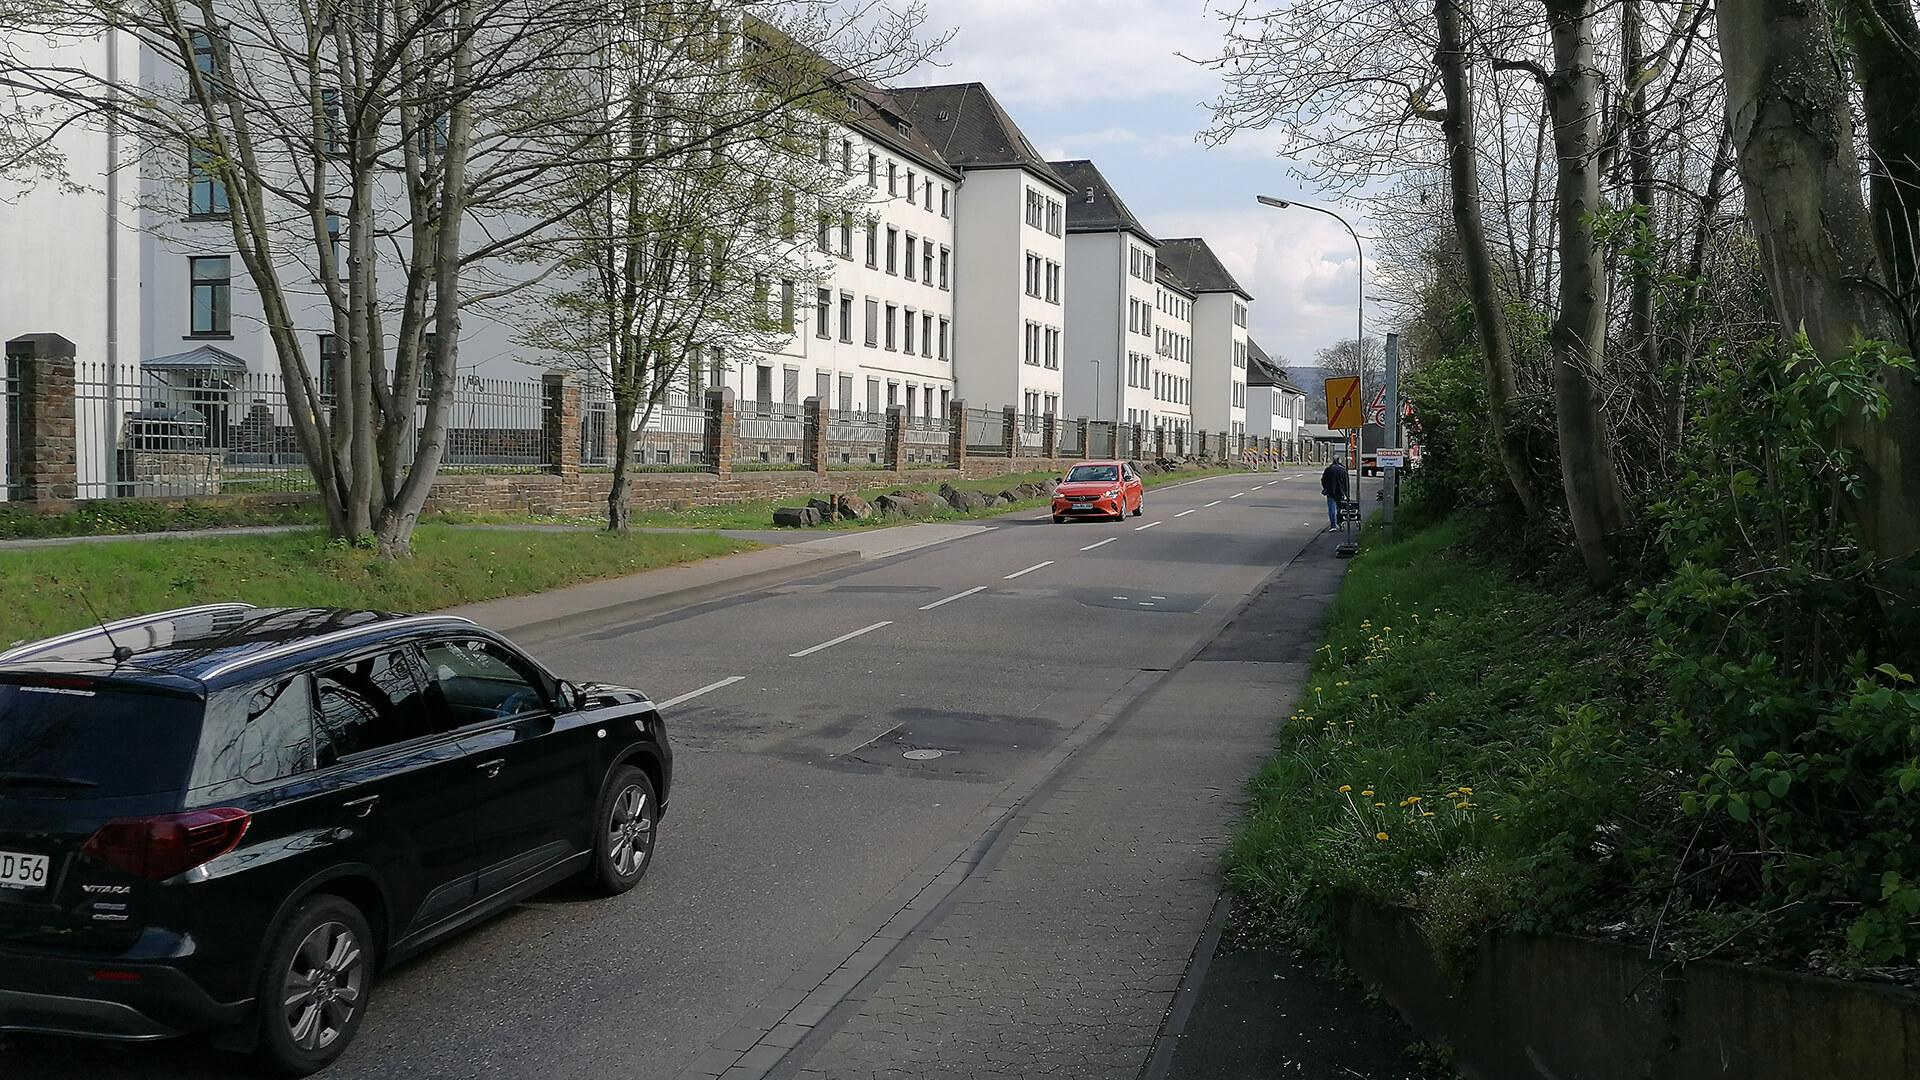 koblenz-luetzel-projekte-handlungsfelder-2-3-1b